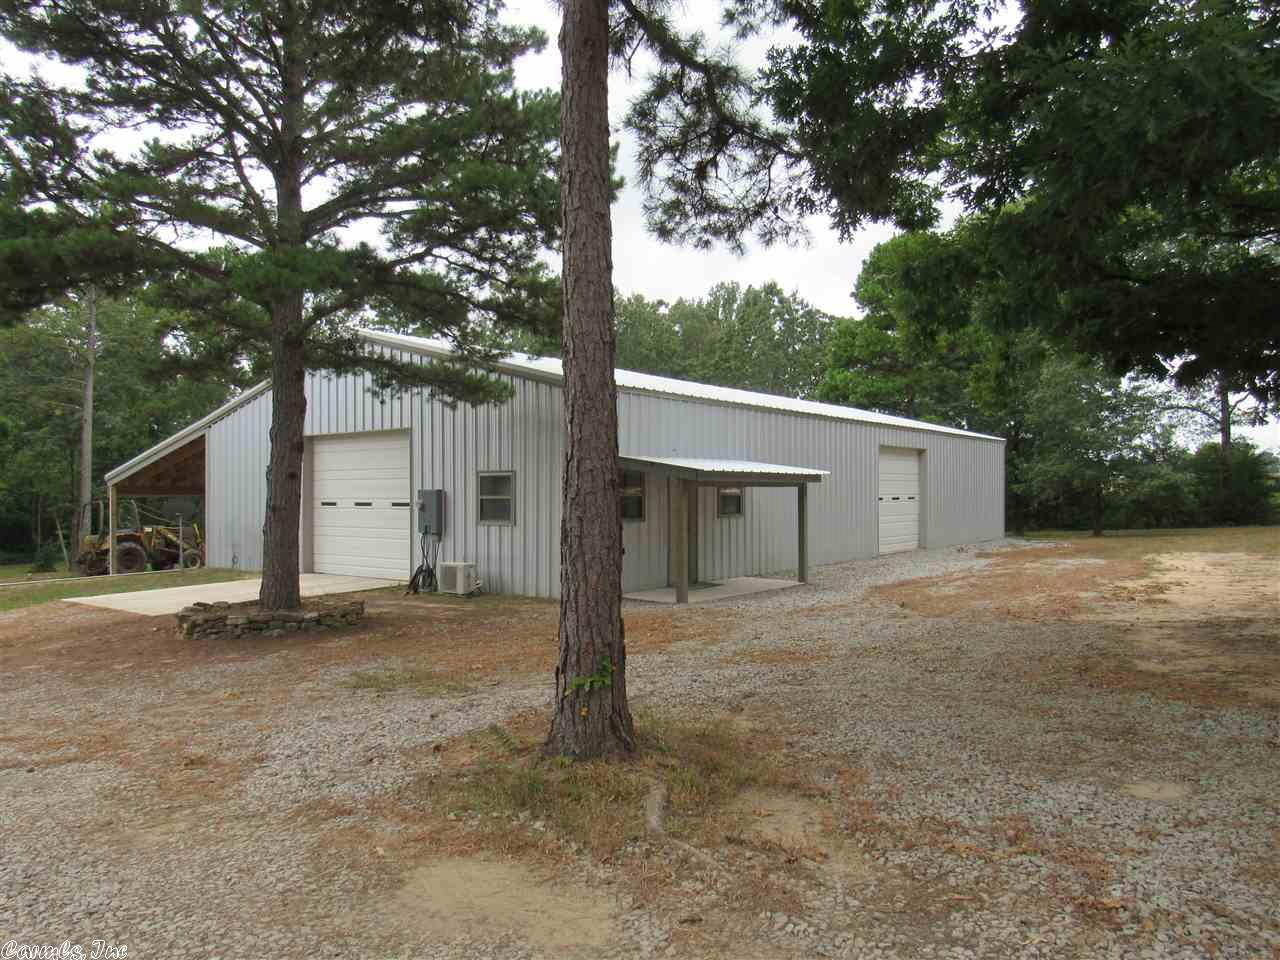 1369 Edgemont Rd, Quitman, Arkansas 72131, 1 Bedroom Bedrooms, ,1 BathroomBathrooms,Single Family,For Sale,1369 Edgemont Rd,1,21005099